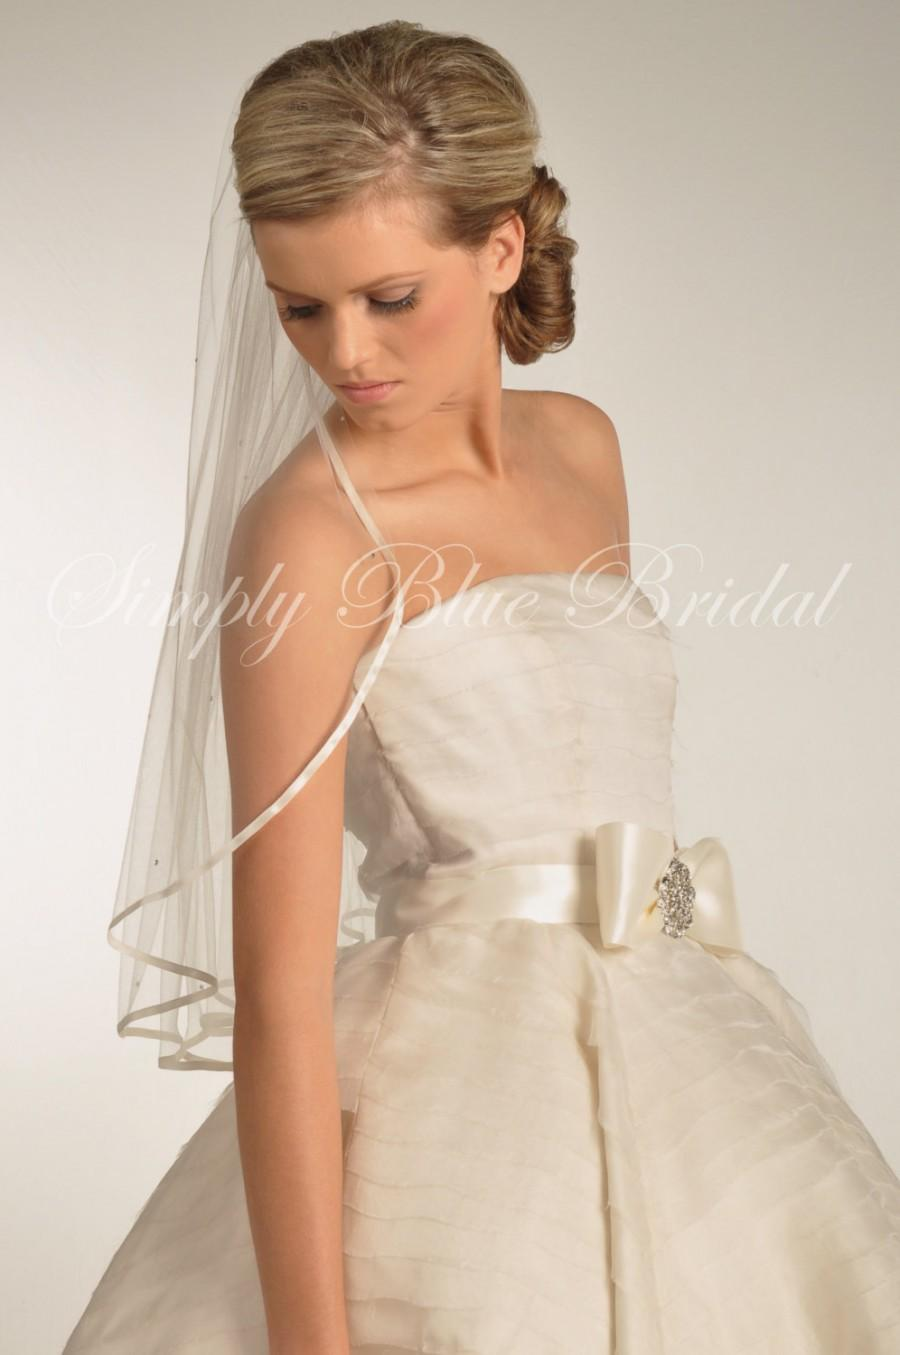 Mariage - Wedding Veil - Ribbon Veil, Swarovski Crystal Bridal Veil, Veil with Satin Ribbon Edge & Scattered Swarovski Crystals